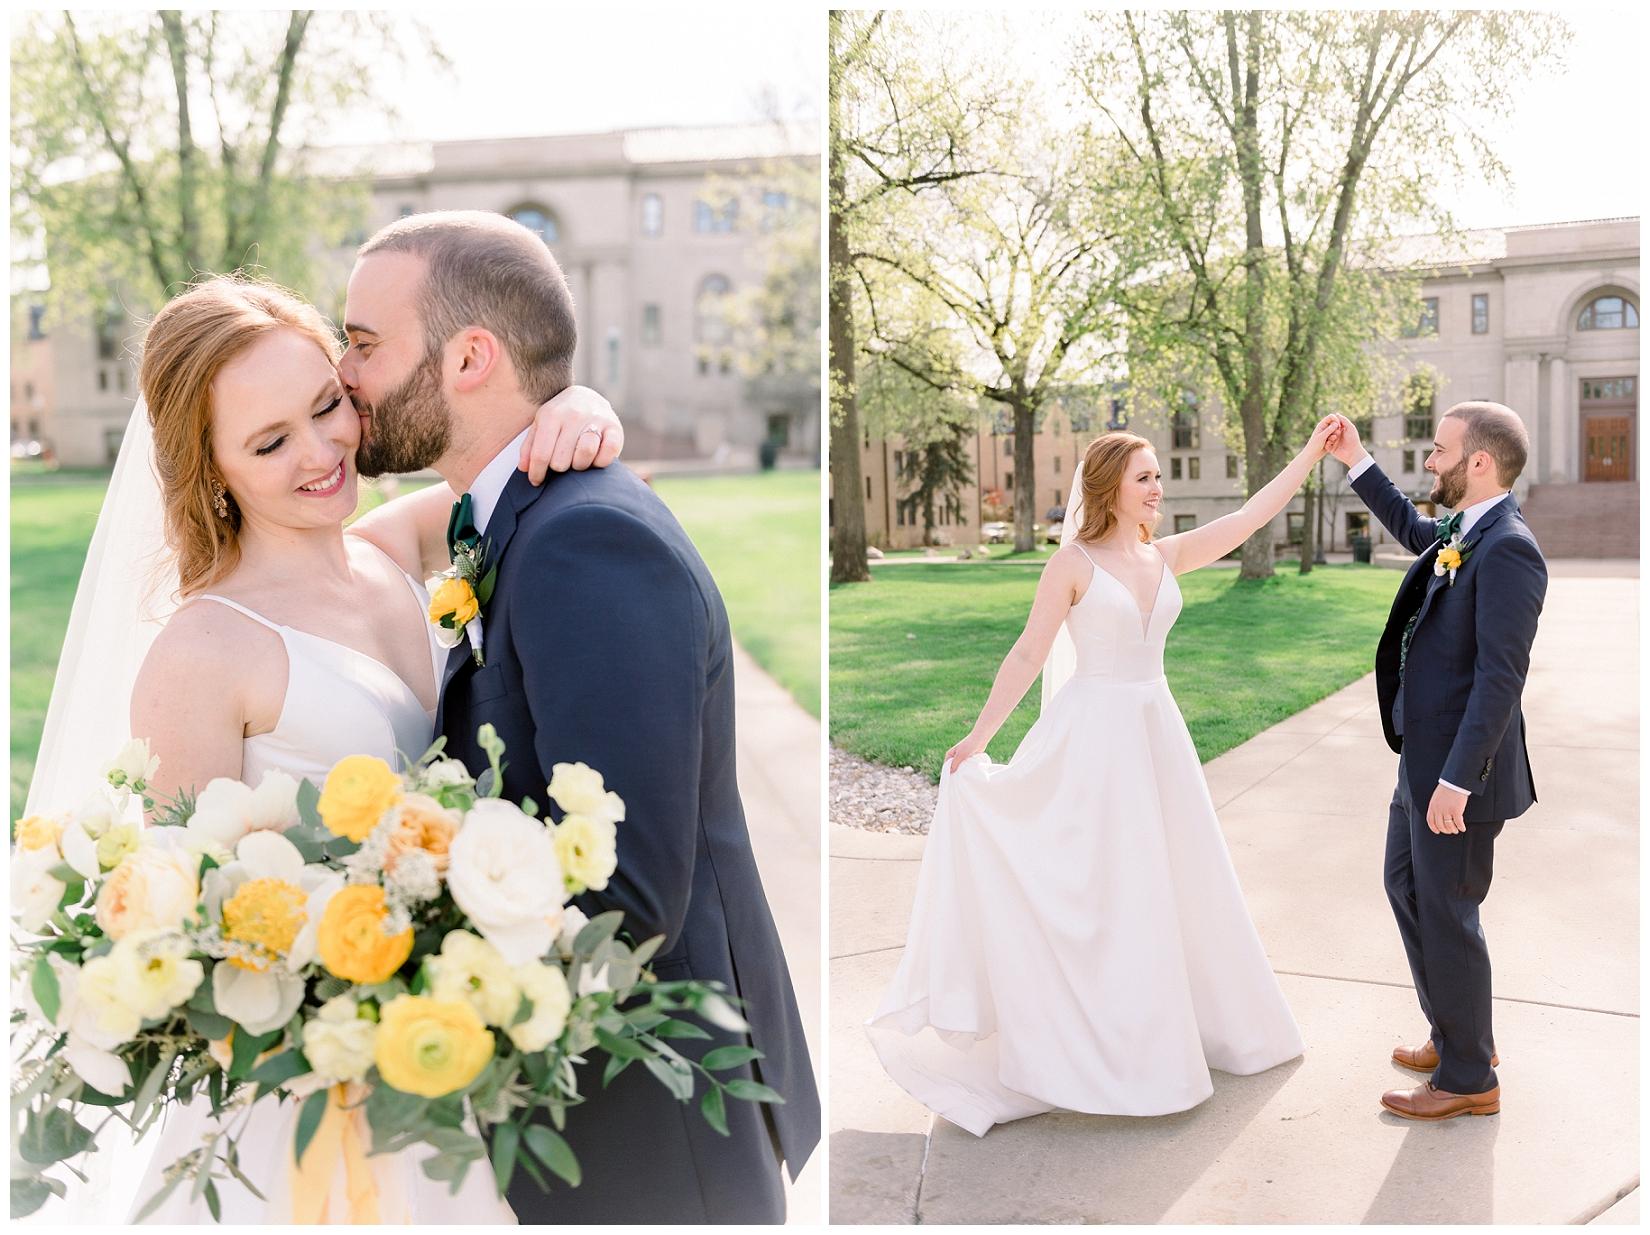 cat-alkire-wedding-photographer-indiana-chicago-indianapolis-fort-wayne_1219.jpg